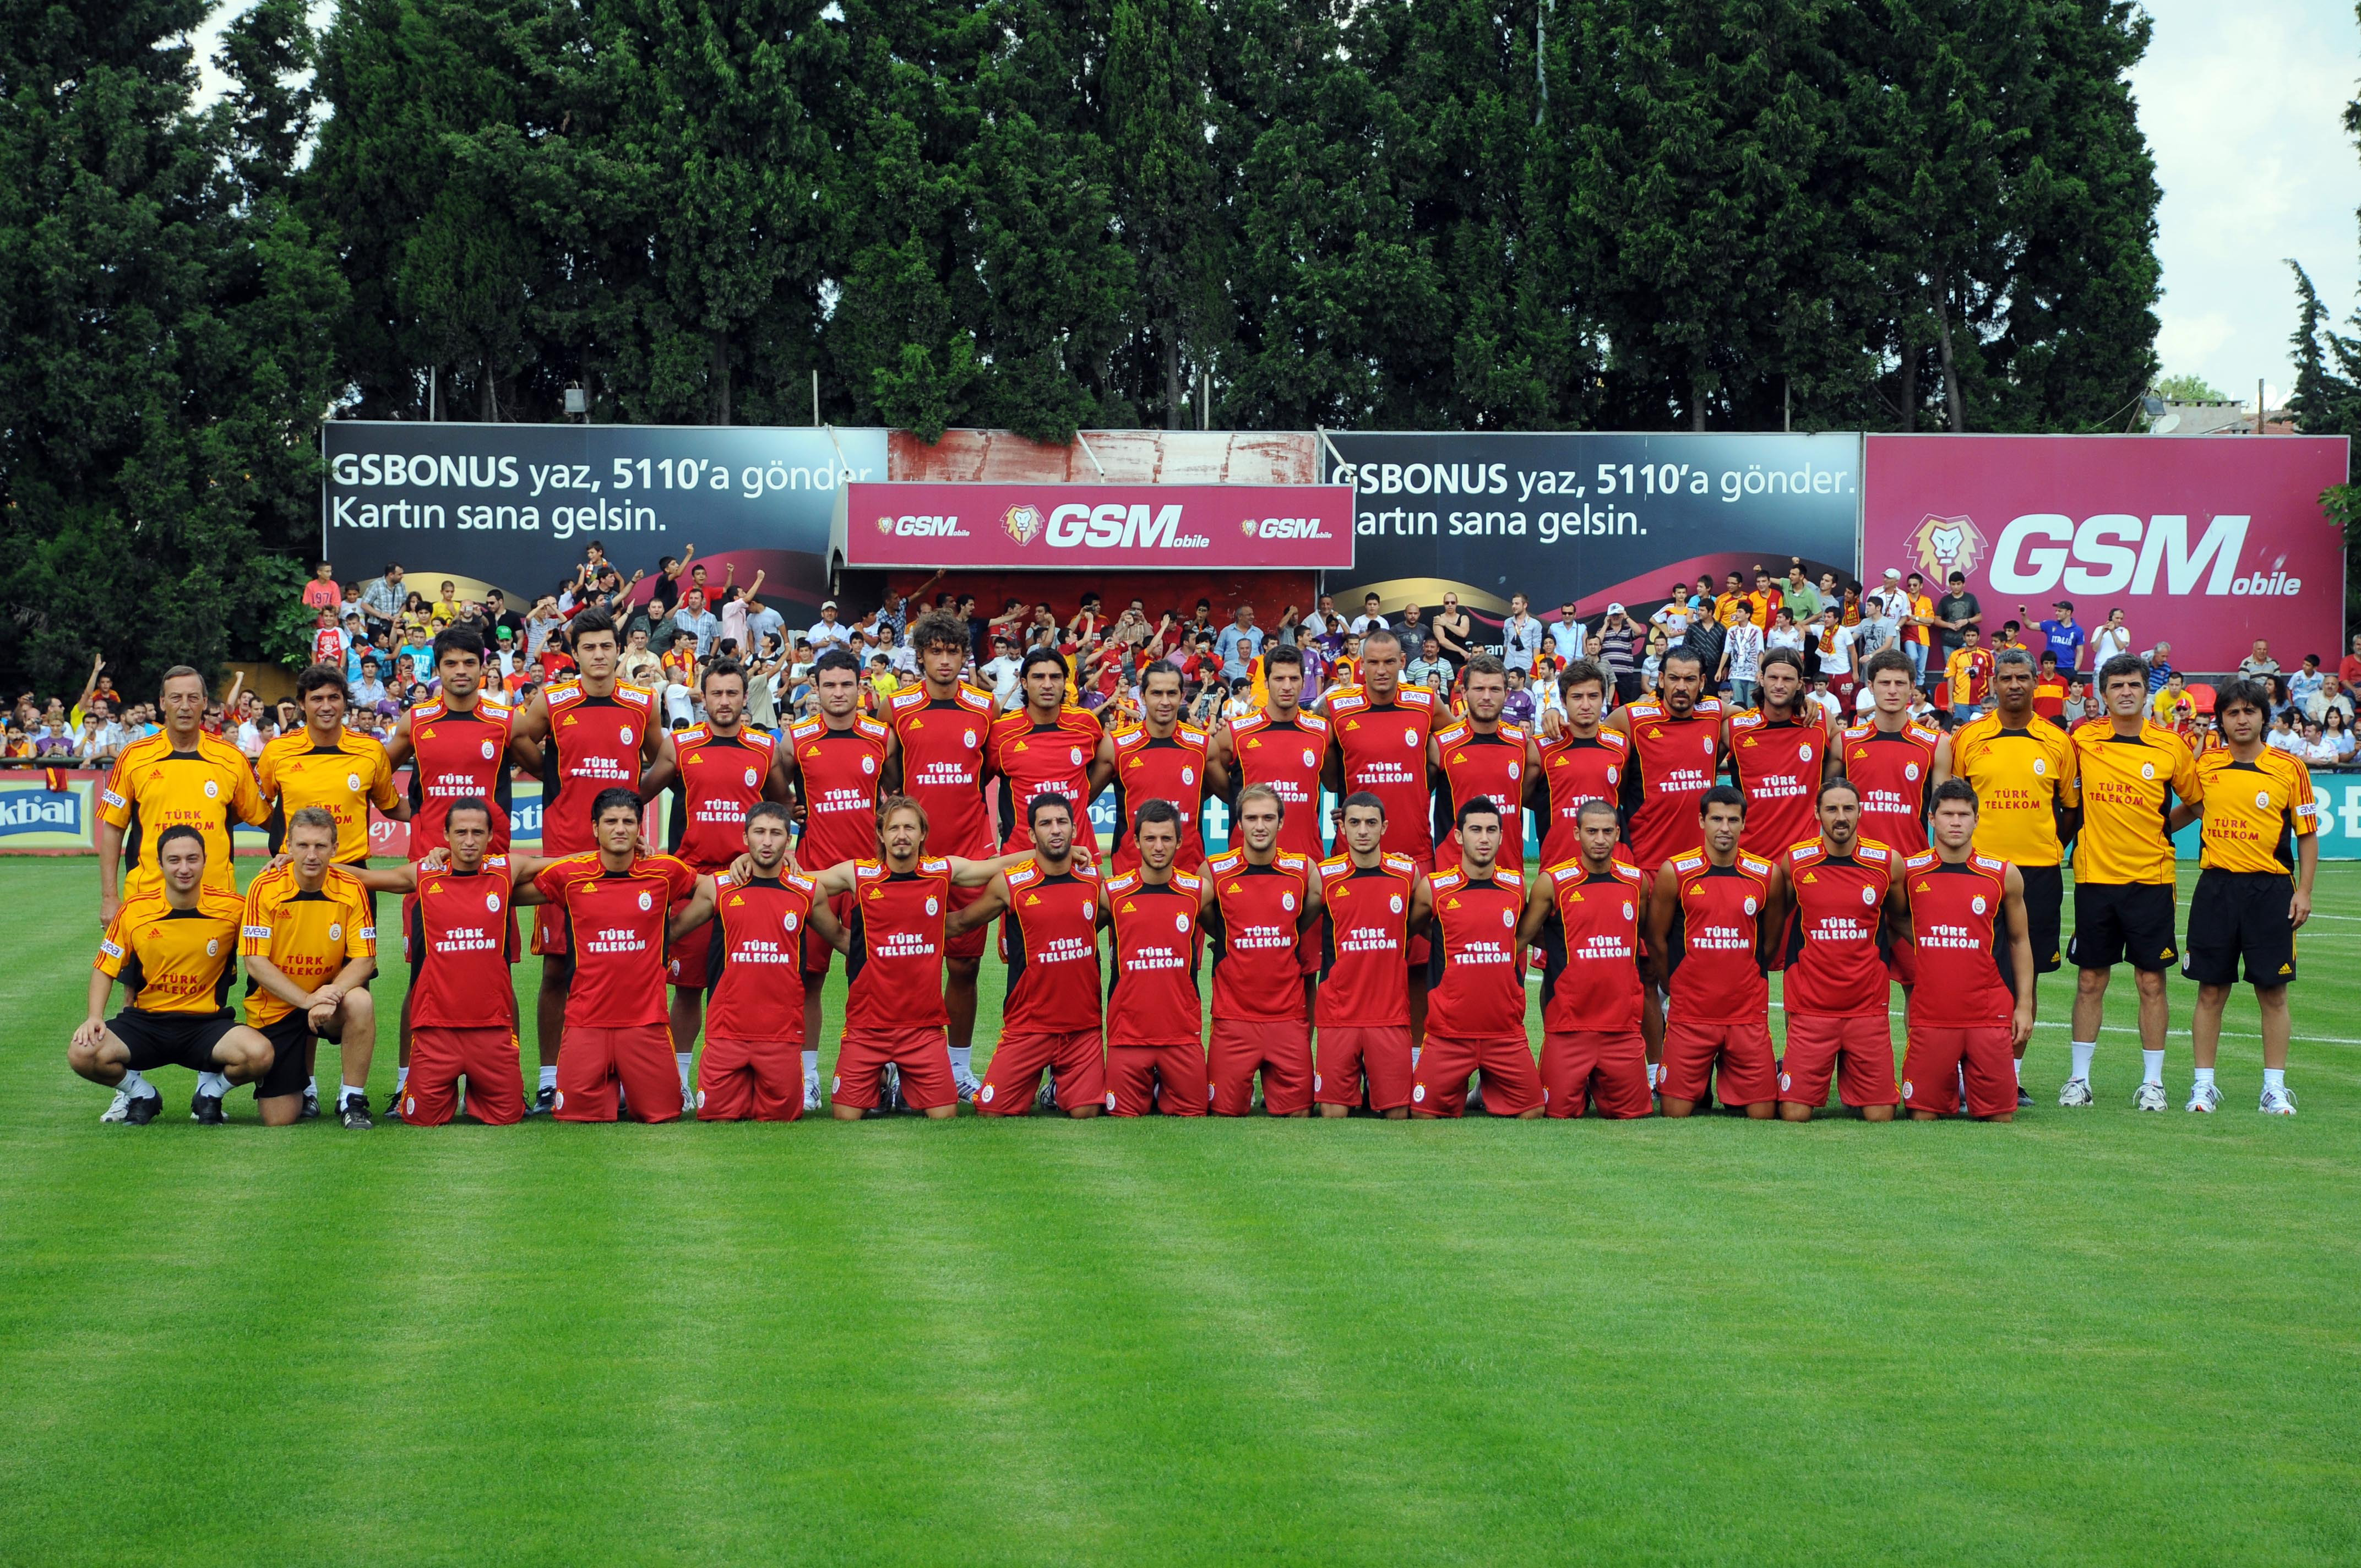 Galatasaray Futbol Tak  M    2010 2011 Sezonu Haz  Rl  Klar  Na